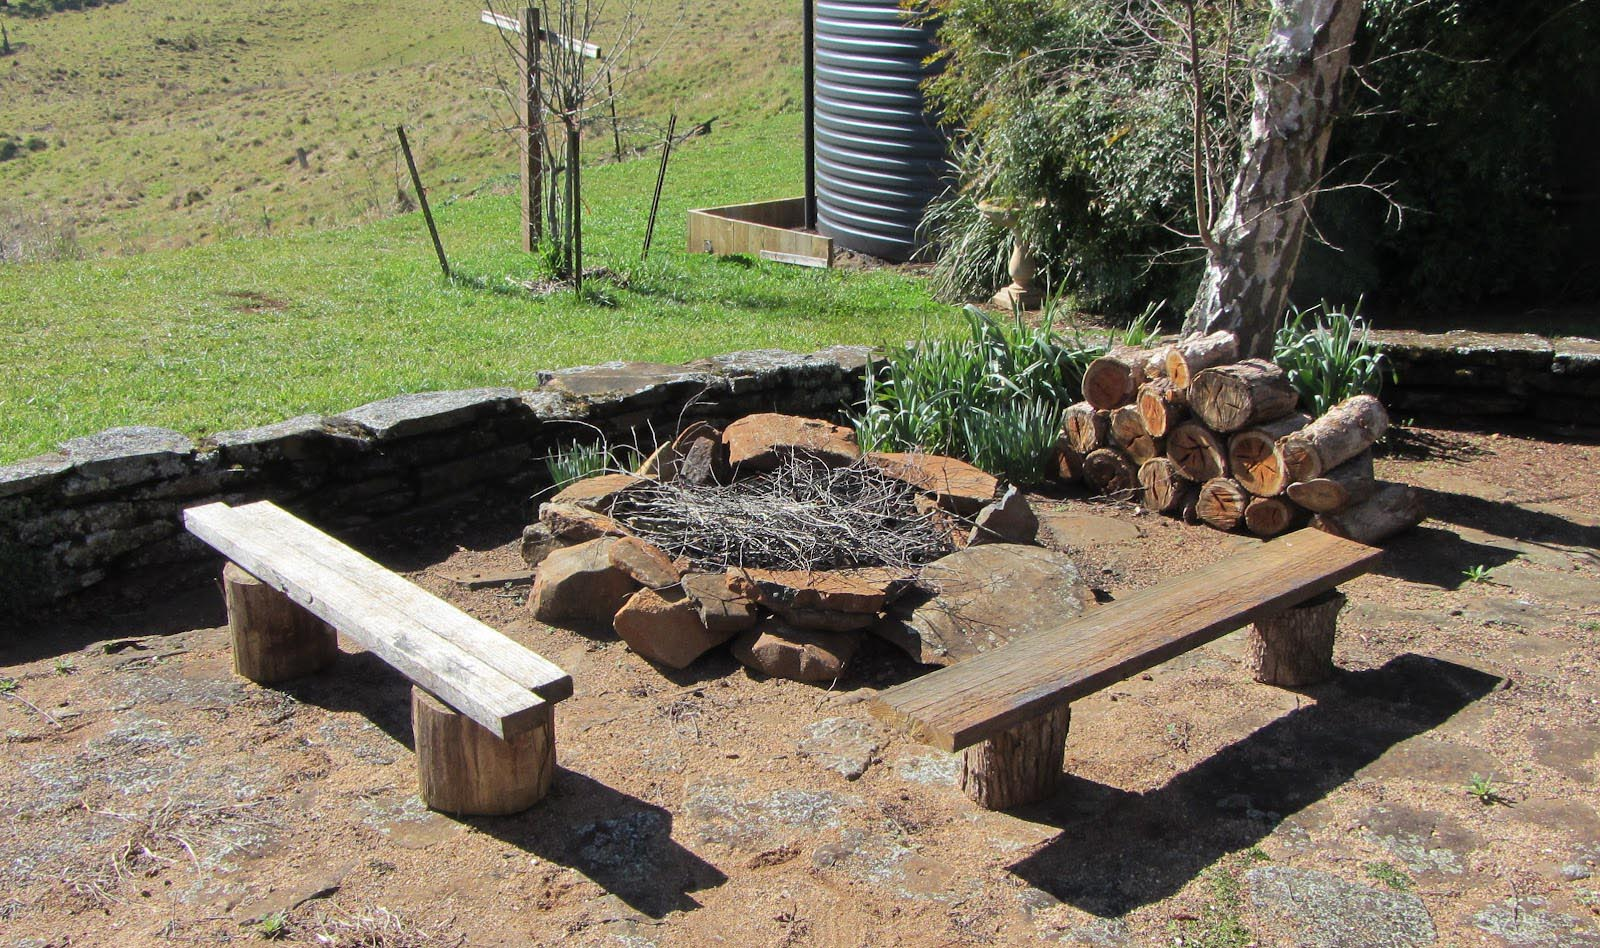 Budget DIY Backyard Fire Pit Ideas | Fire Pit Design Ideas on Backyard Fire Pit Ideas Diy id=92062